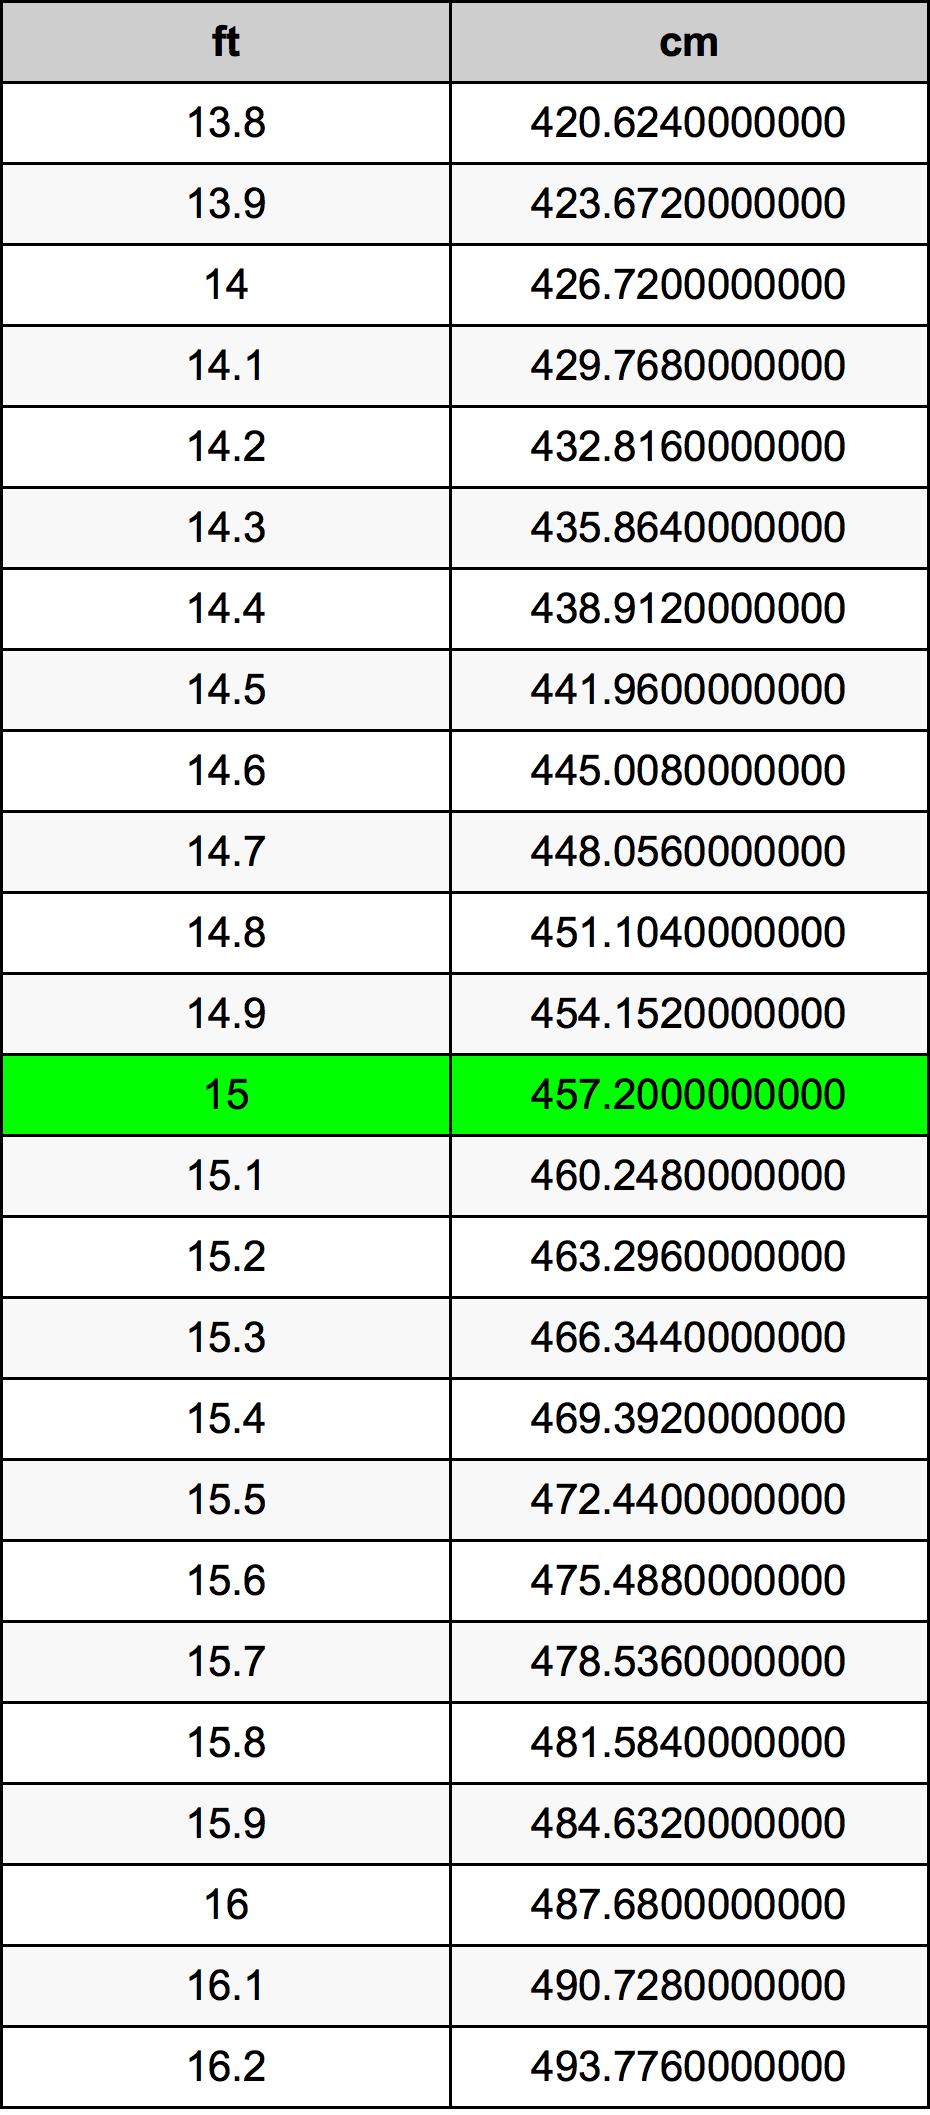 15 Piedi konverżjoni tabella